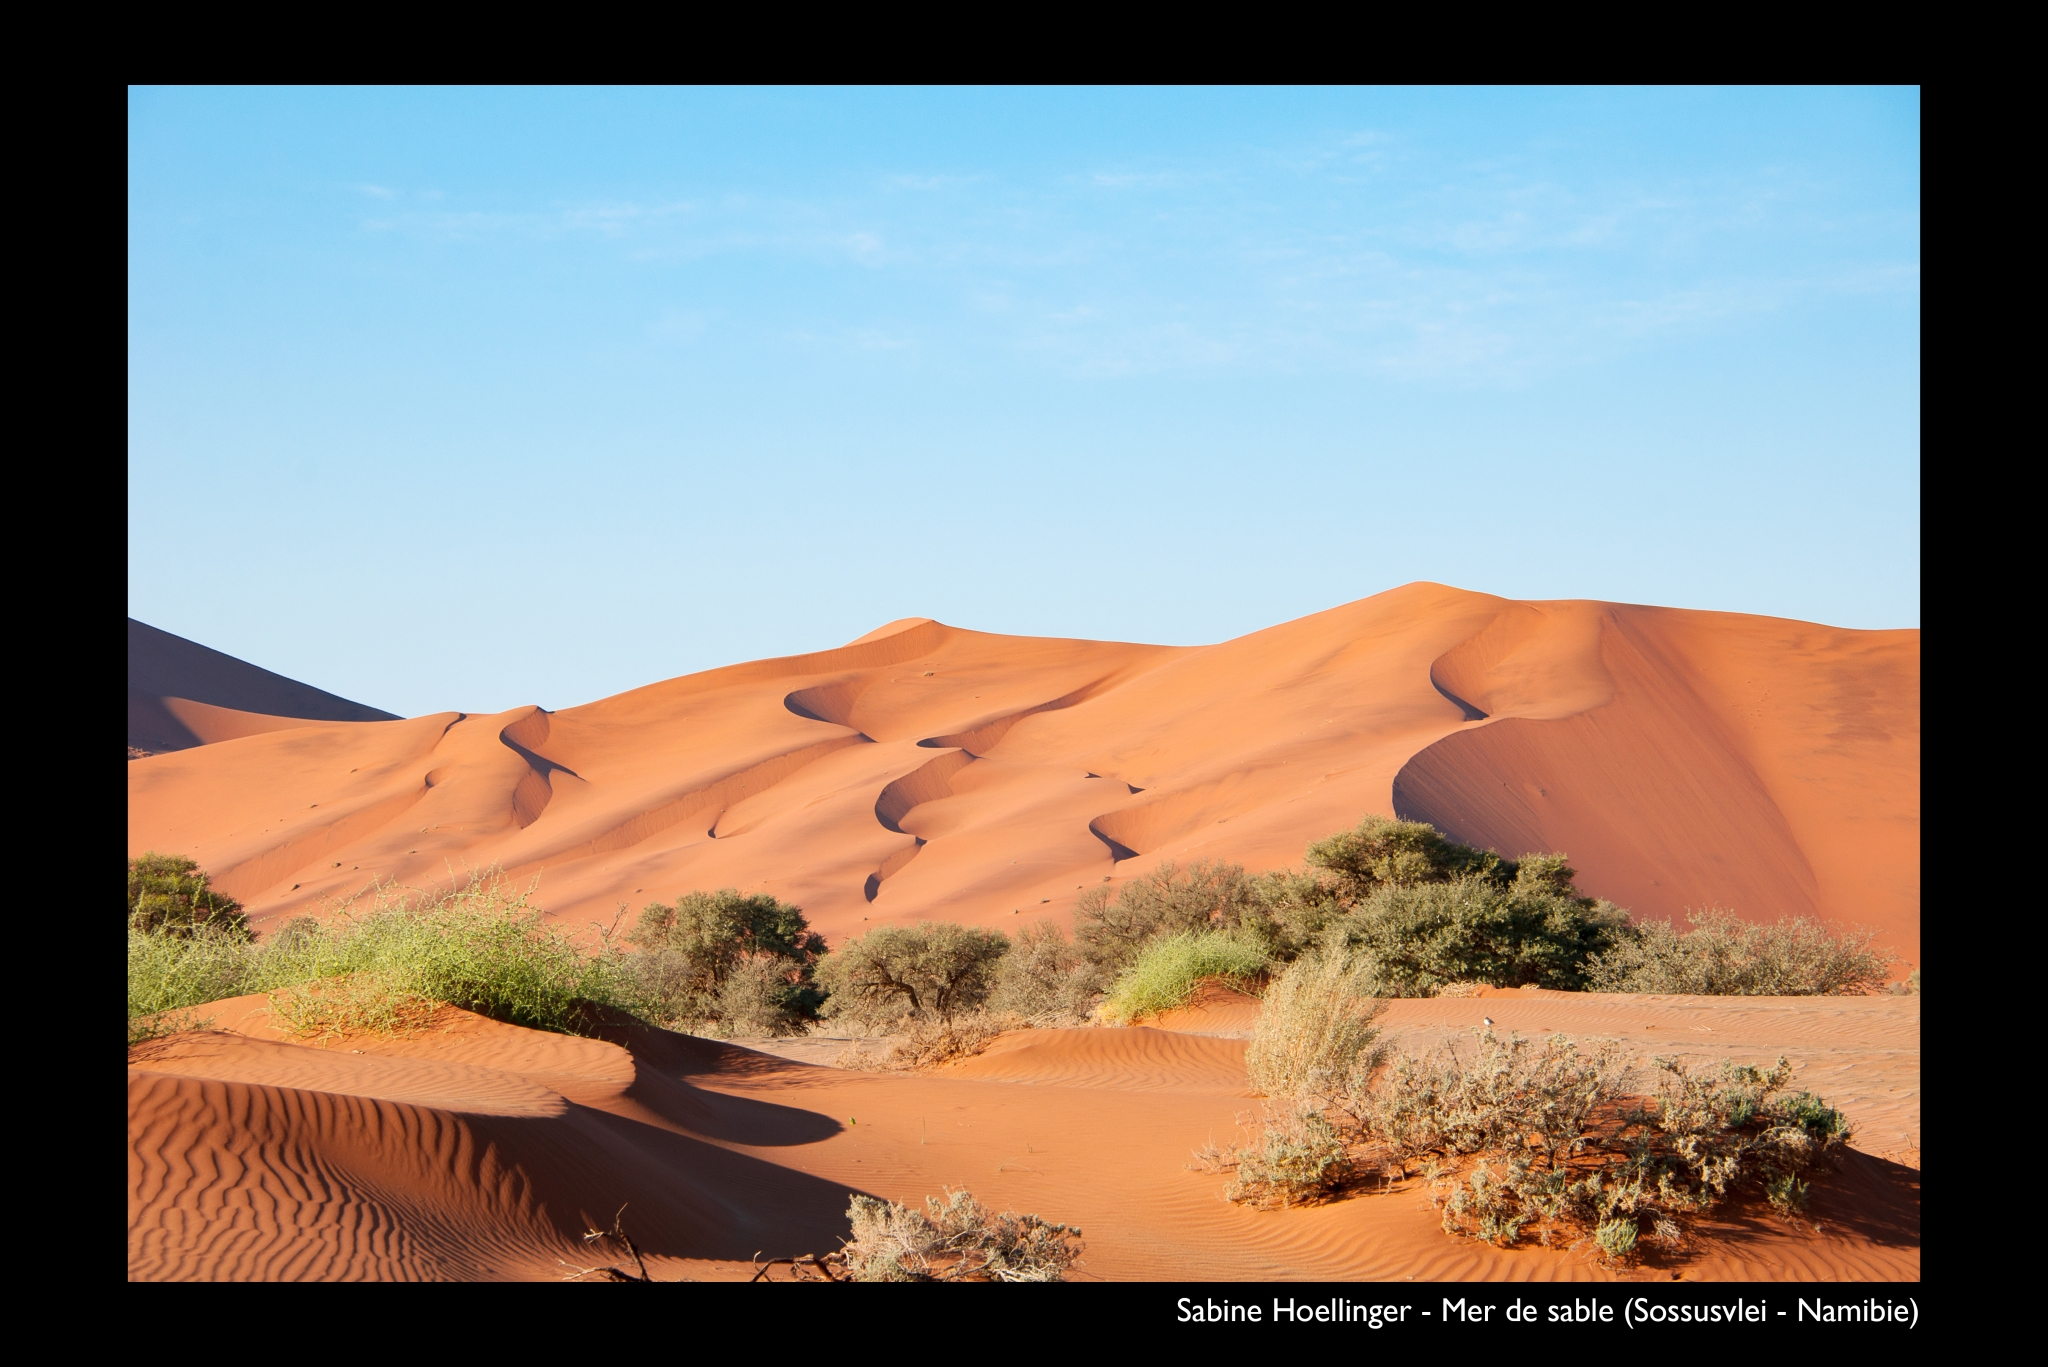 HOELLINGER Sabine - Expo 2018 - Papier 5 - Mer de sable (Sossusvlei - Namibie)